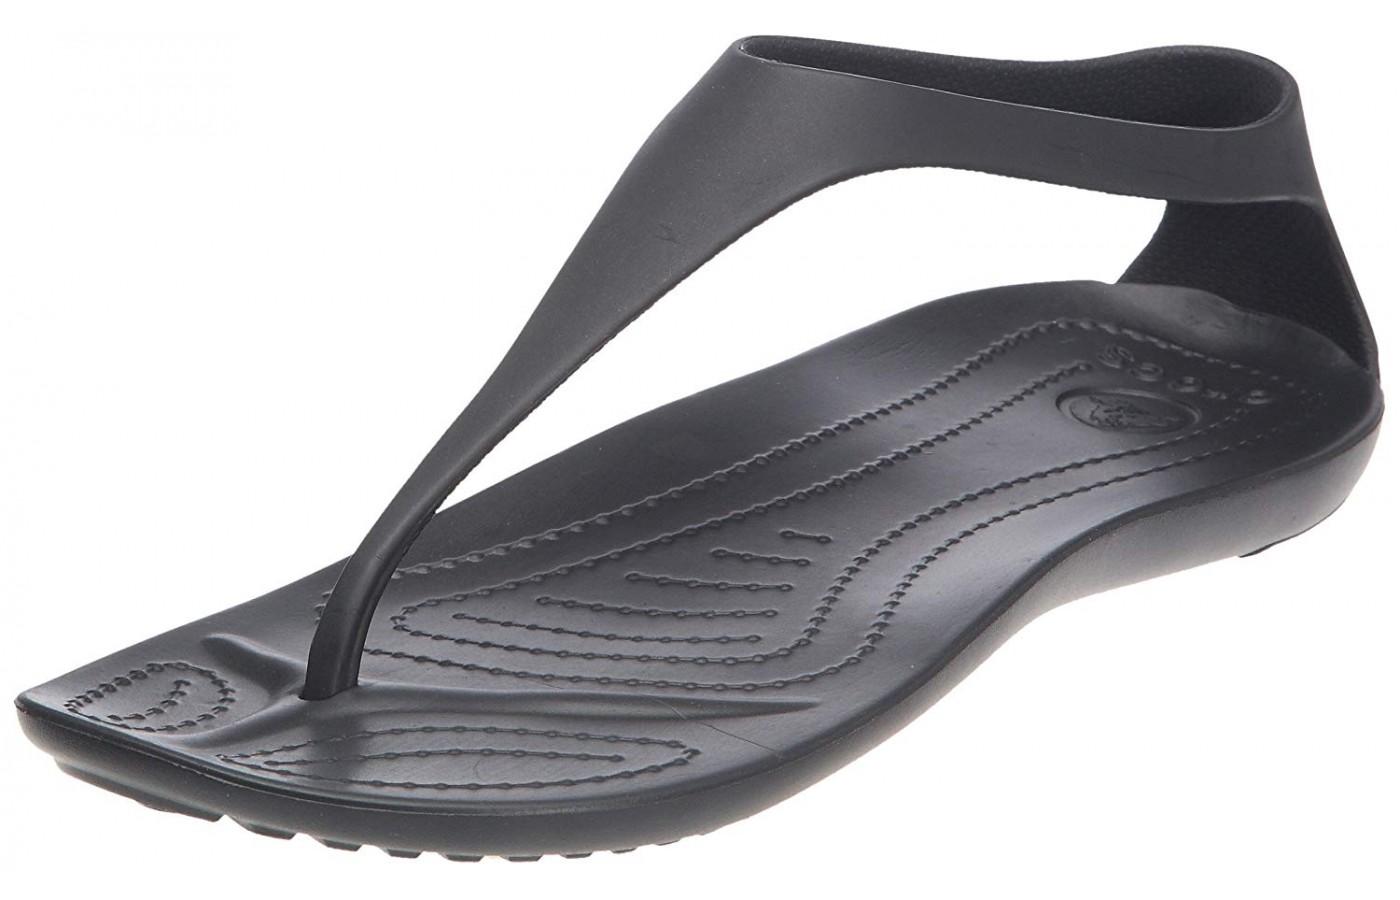 Crocs Sexi Flip Angled